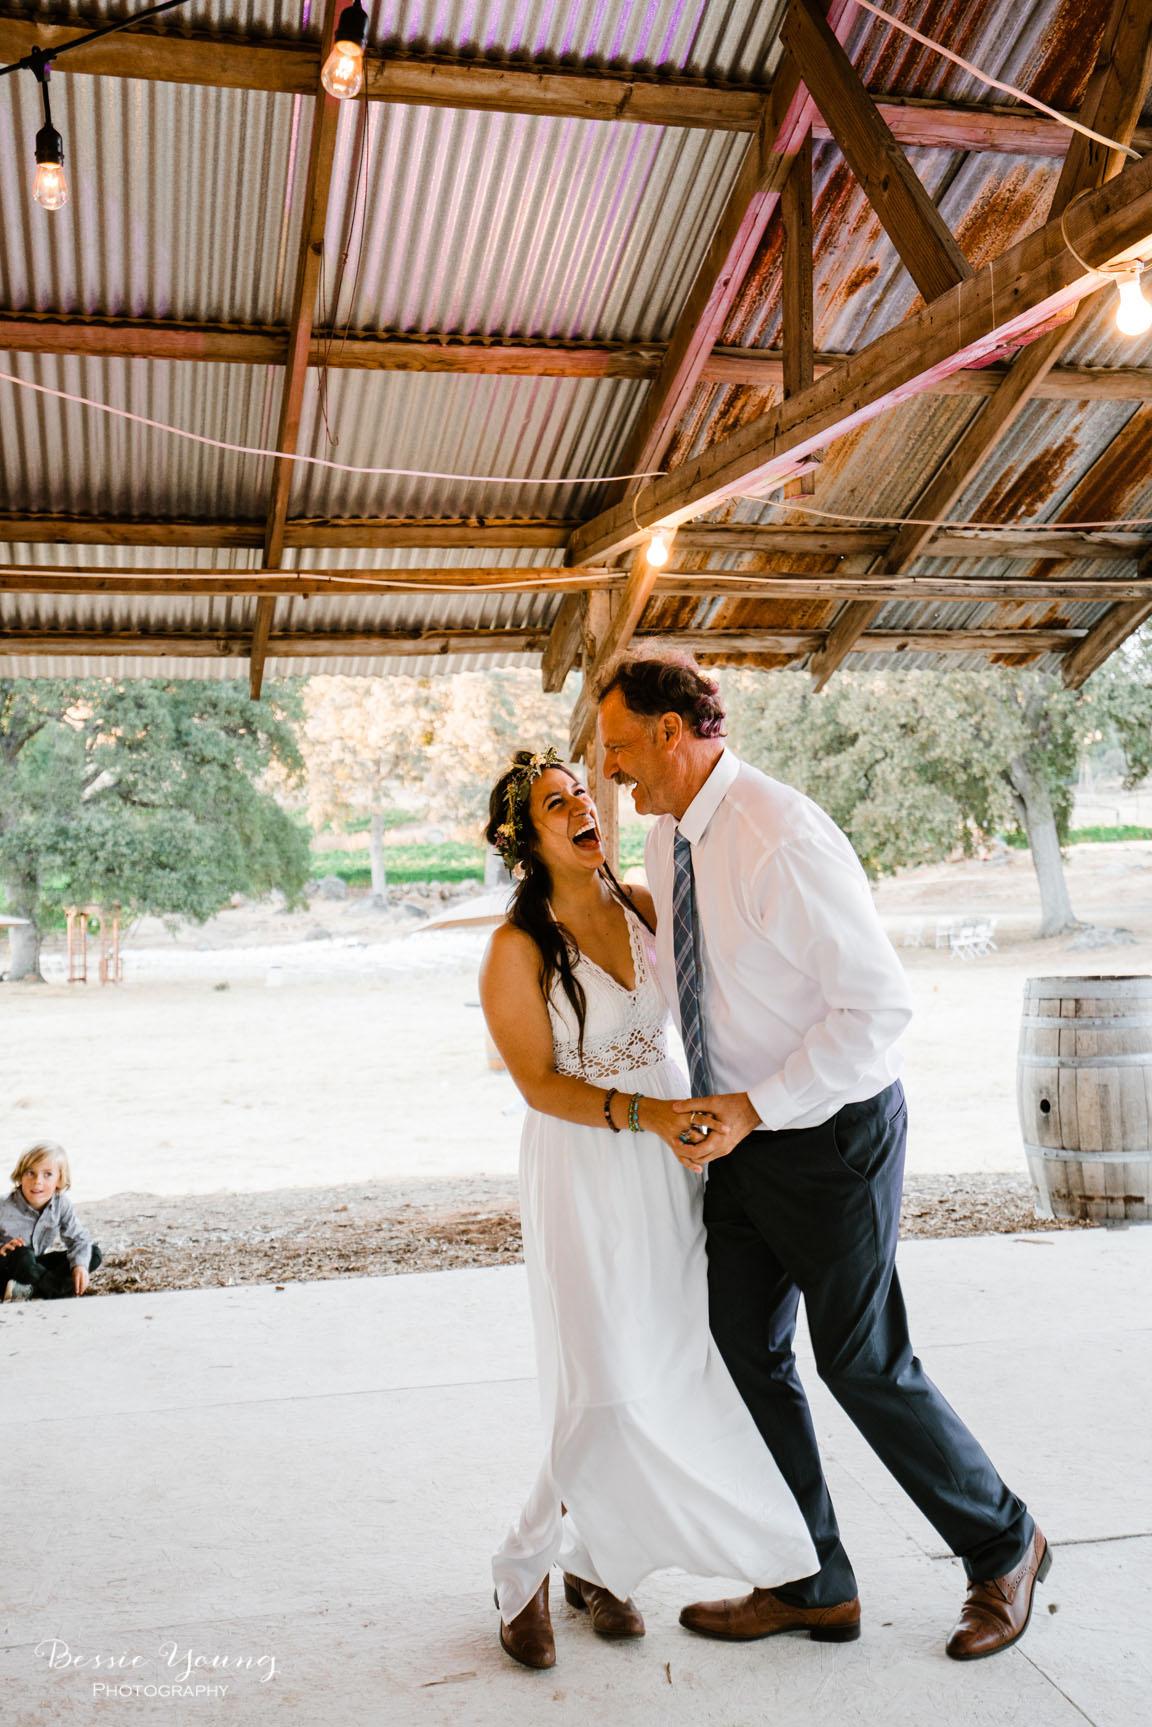 Zuni Vineyards Wedding Sonora - Samira and Justin Bessie Young Photography 2018 a-115.jpg